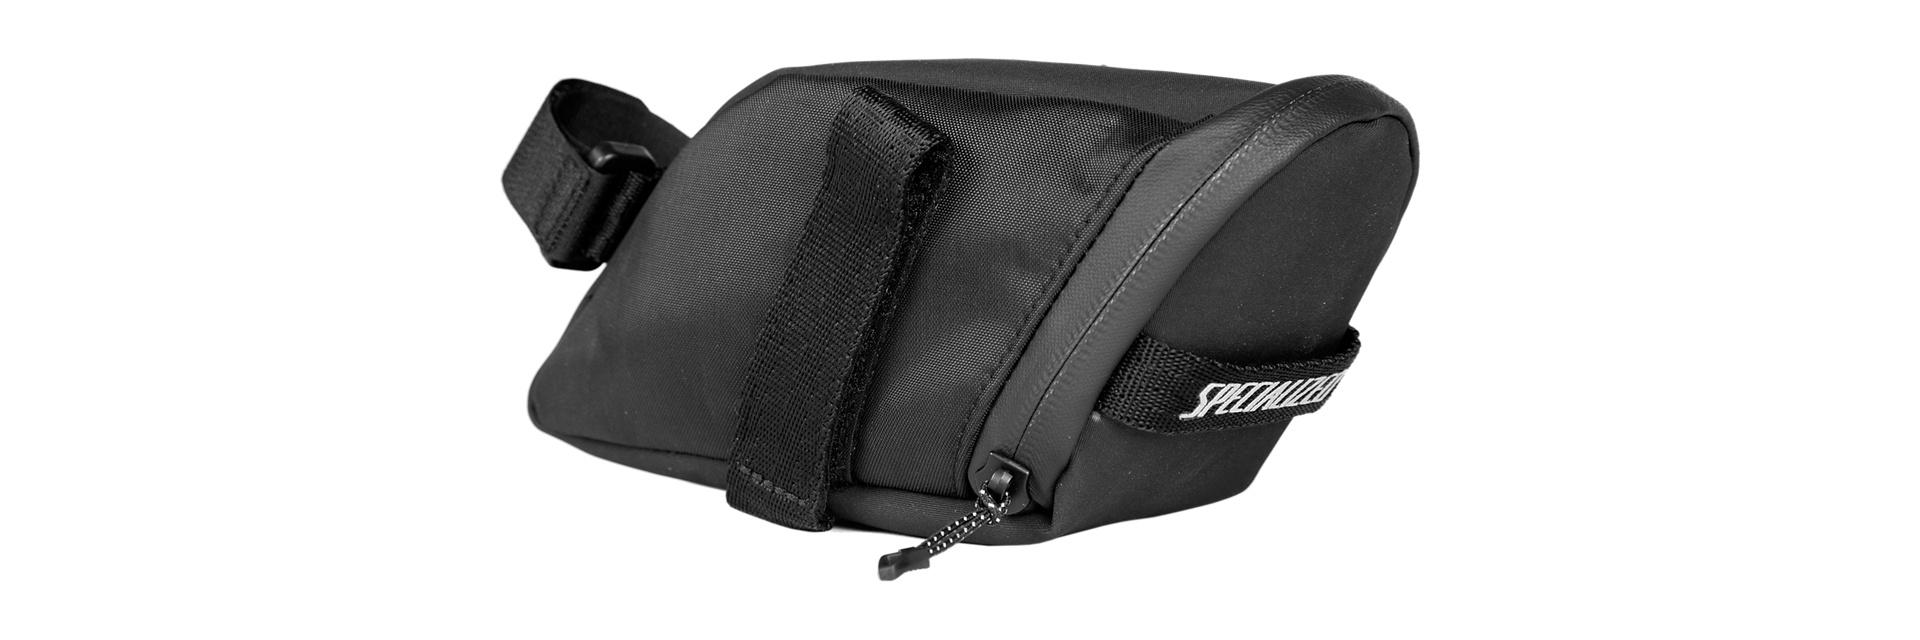 MINI WEDGIE SEAT BAG -Black